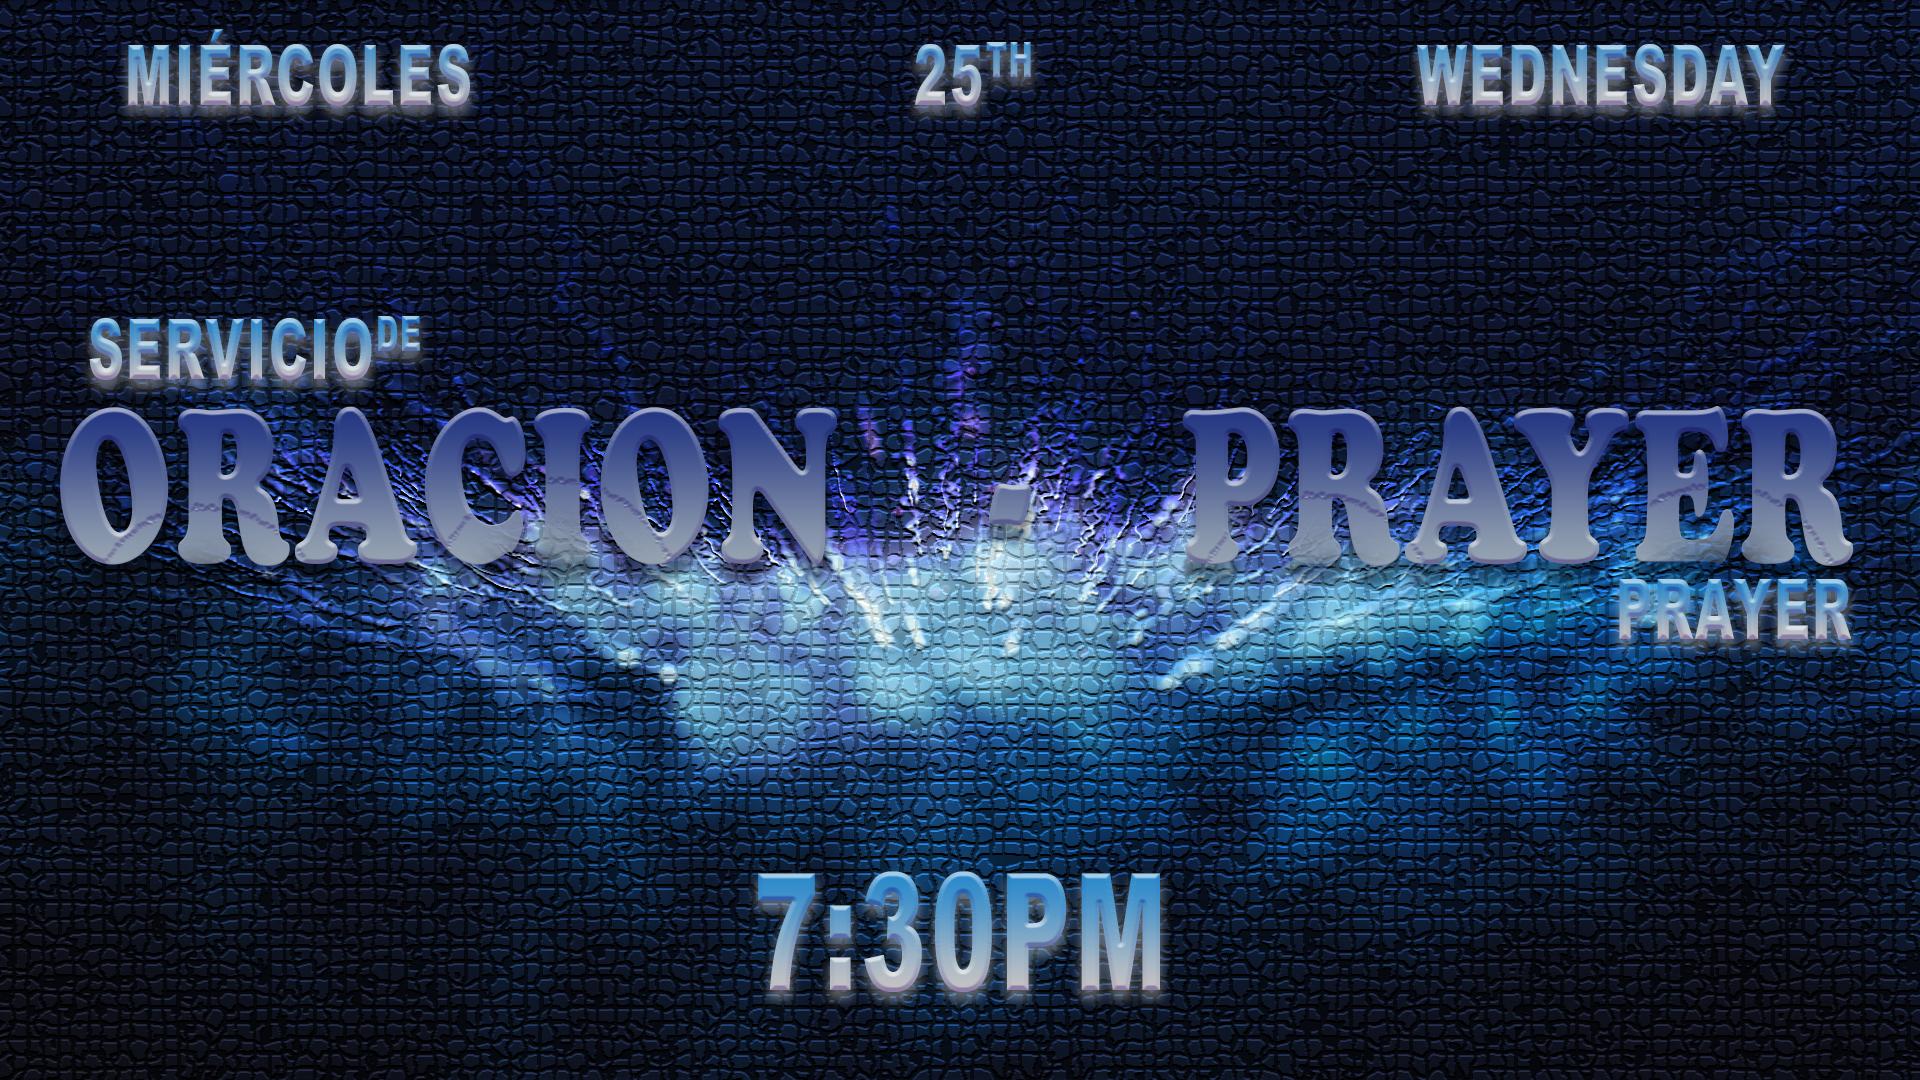 Prayer Service Wed. 25th